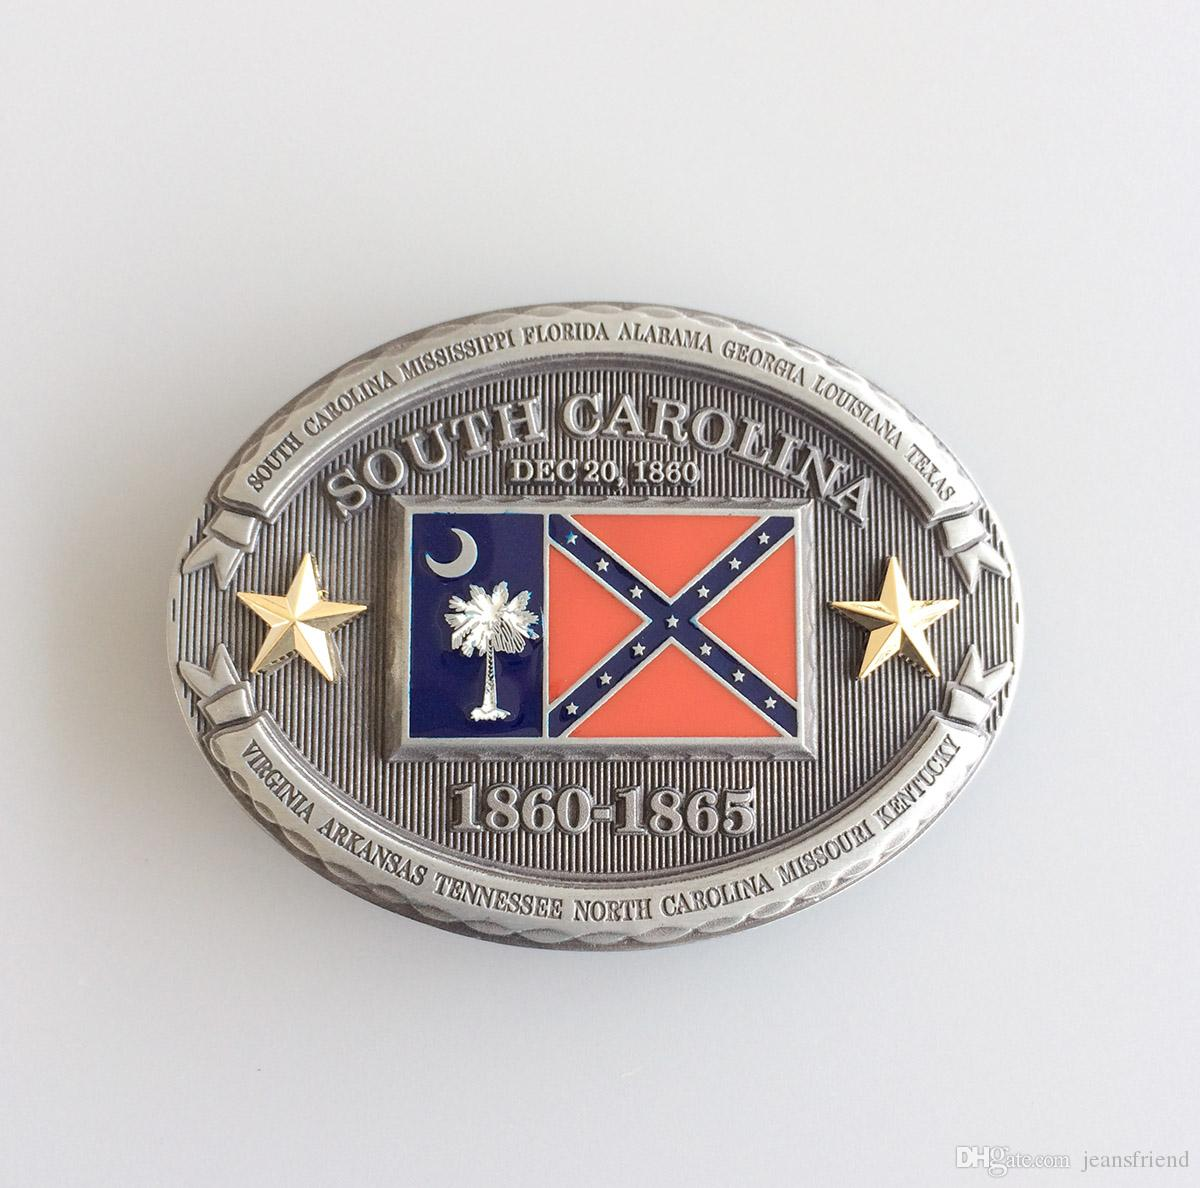 New Vintage Western Oval South Carolina Belt Buckle Gurtelschnalle Boucle  De Ceinture BUCKLE-FG016 Belt Buckle Rebel Confederate Online with   15.33 Piece on ... 1f04309a801